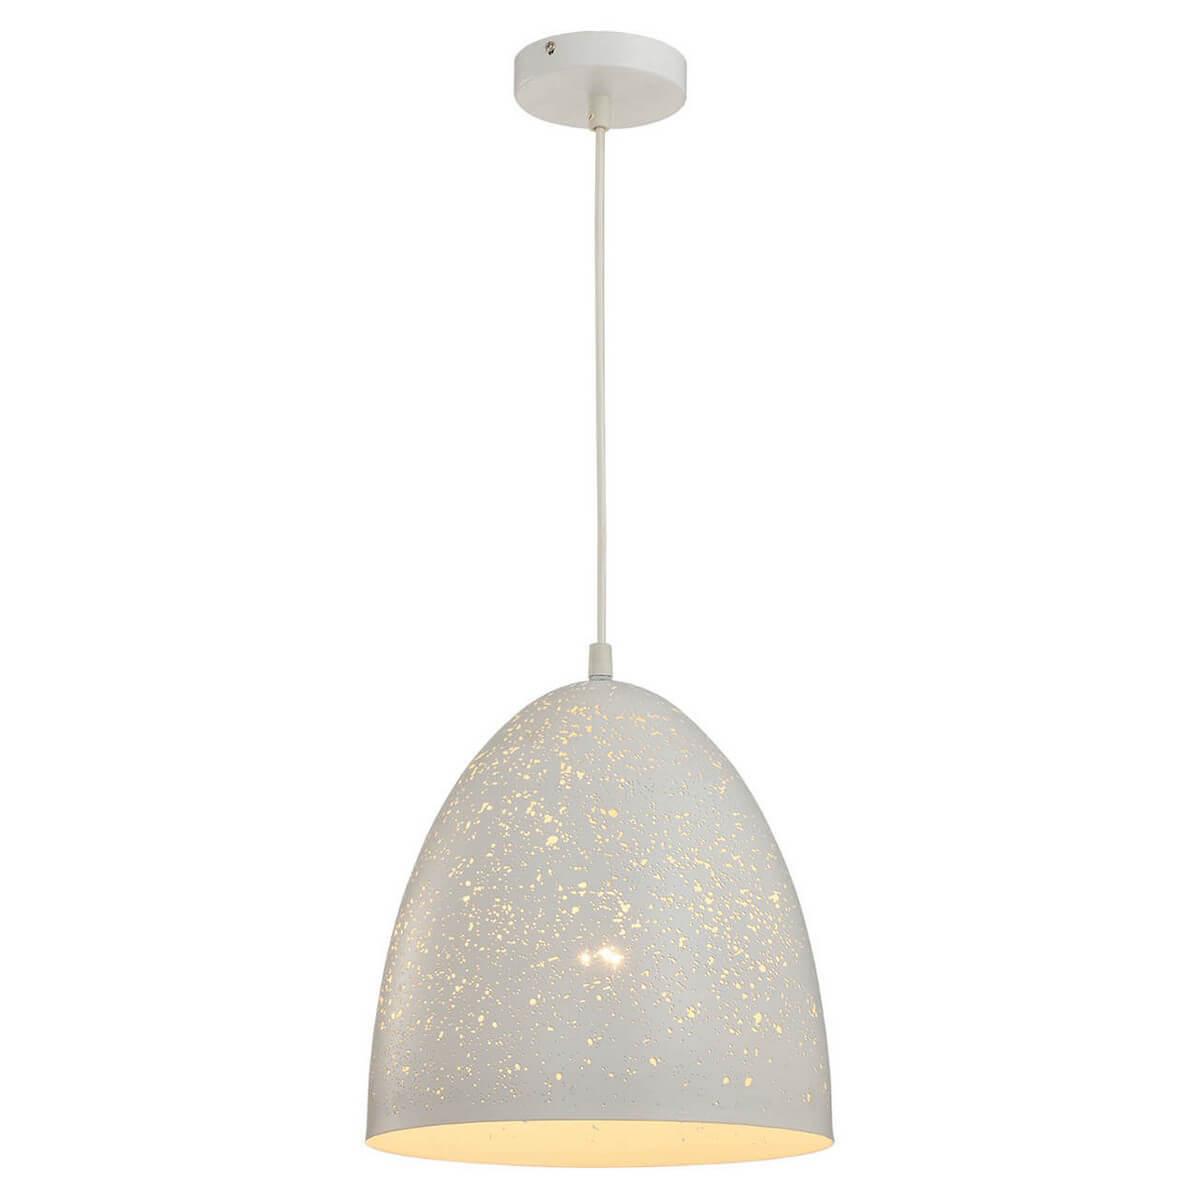 Светильник Lussole LOFT LSP-9891 подвесной светильник lussole loft port chester lsp 9891